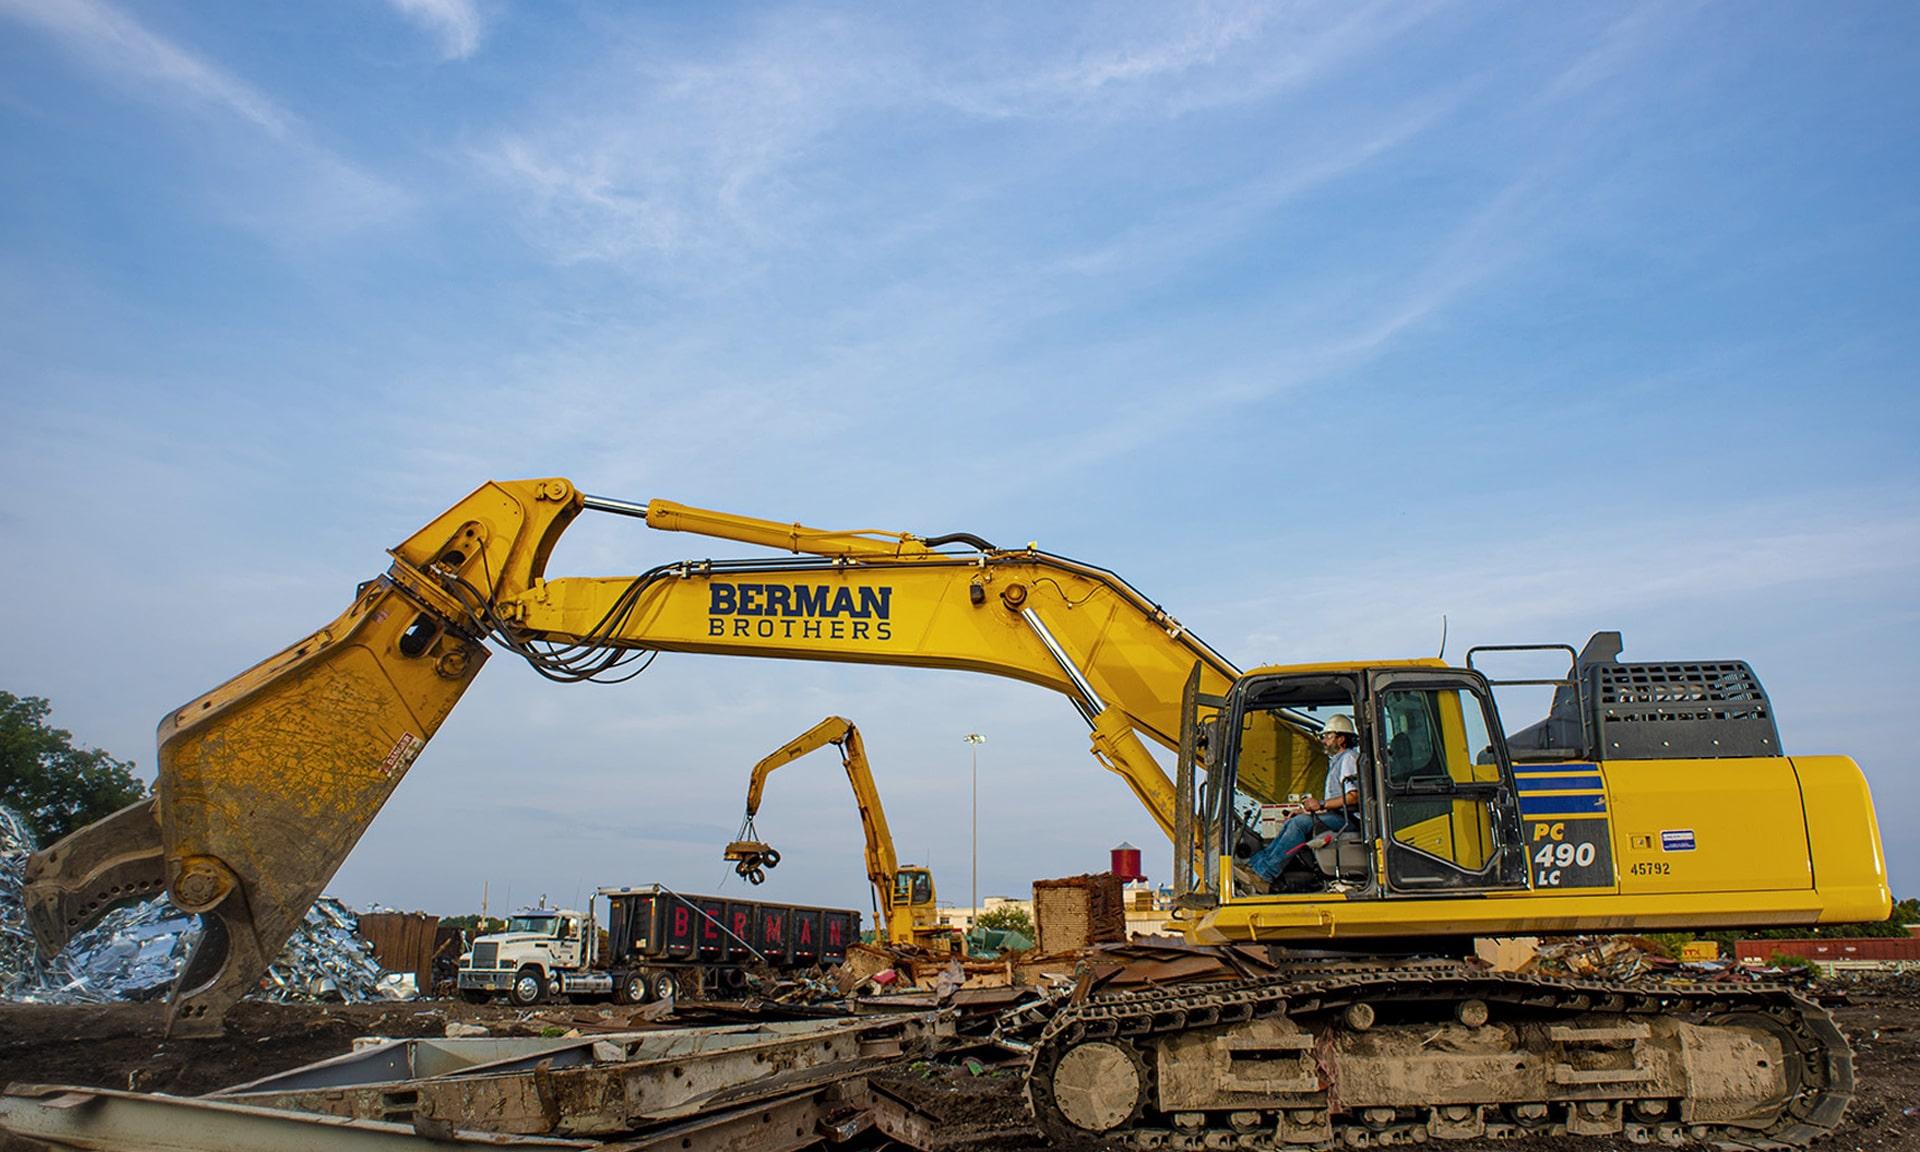 Komatsu hydraulic excavators